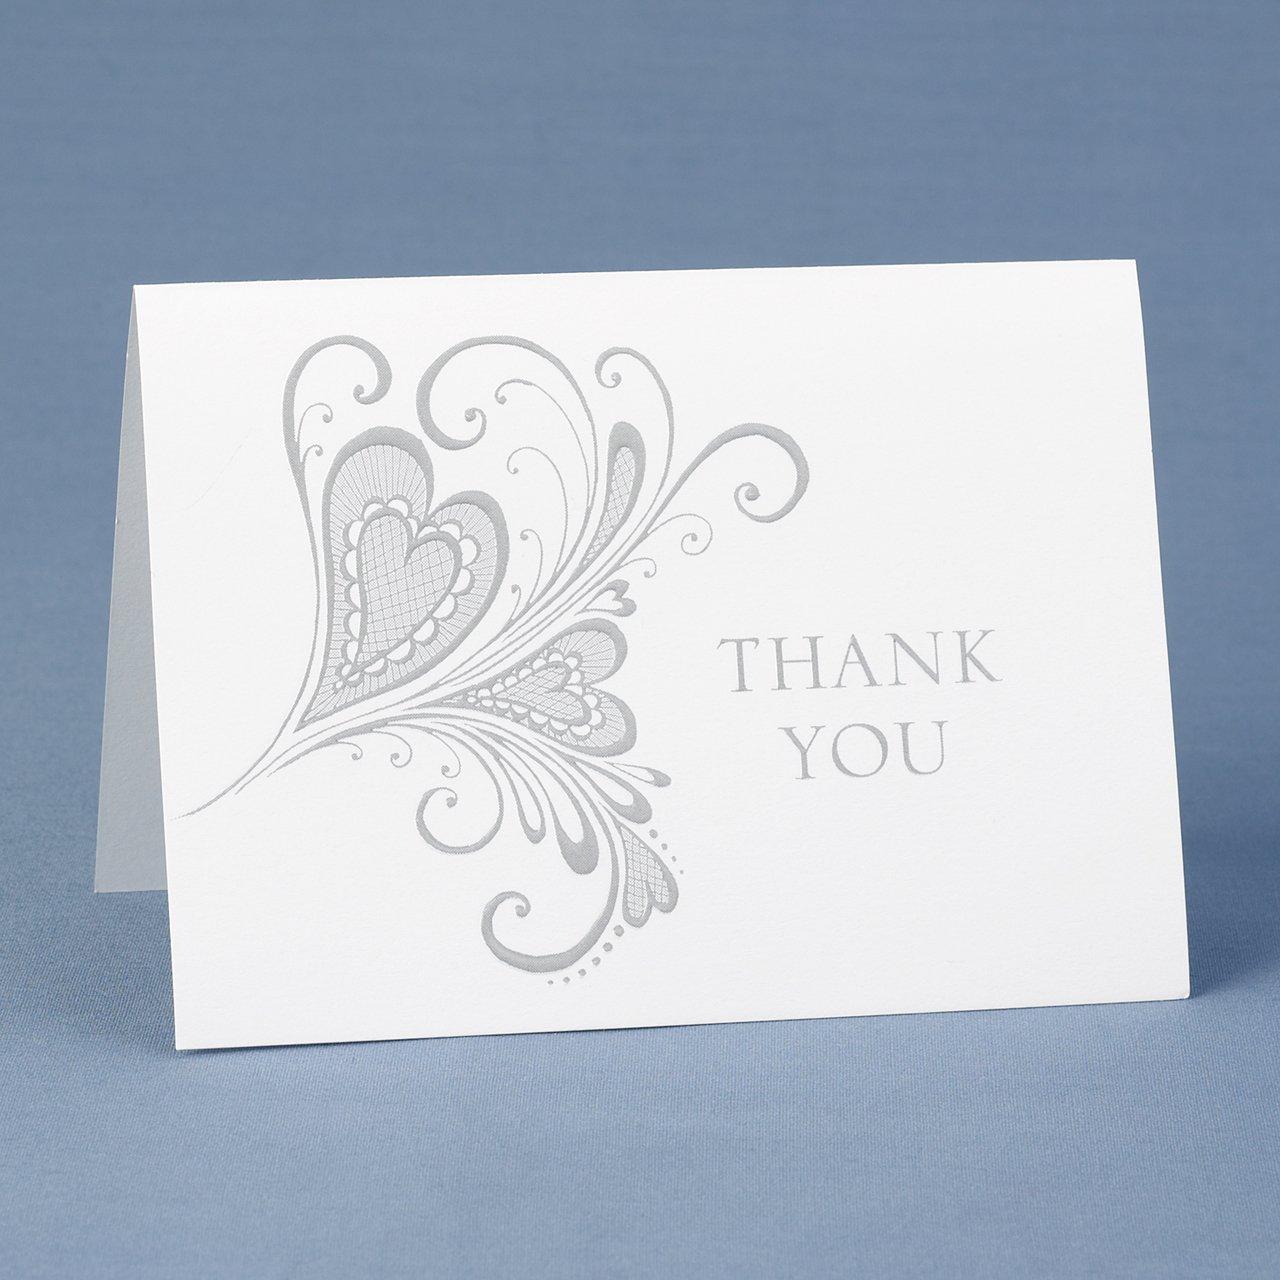 amazoncom hortense b hewitt heartfelt thank you cards wedding accessories set of 50 home u0026 kitchen